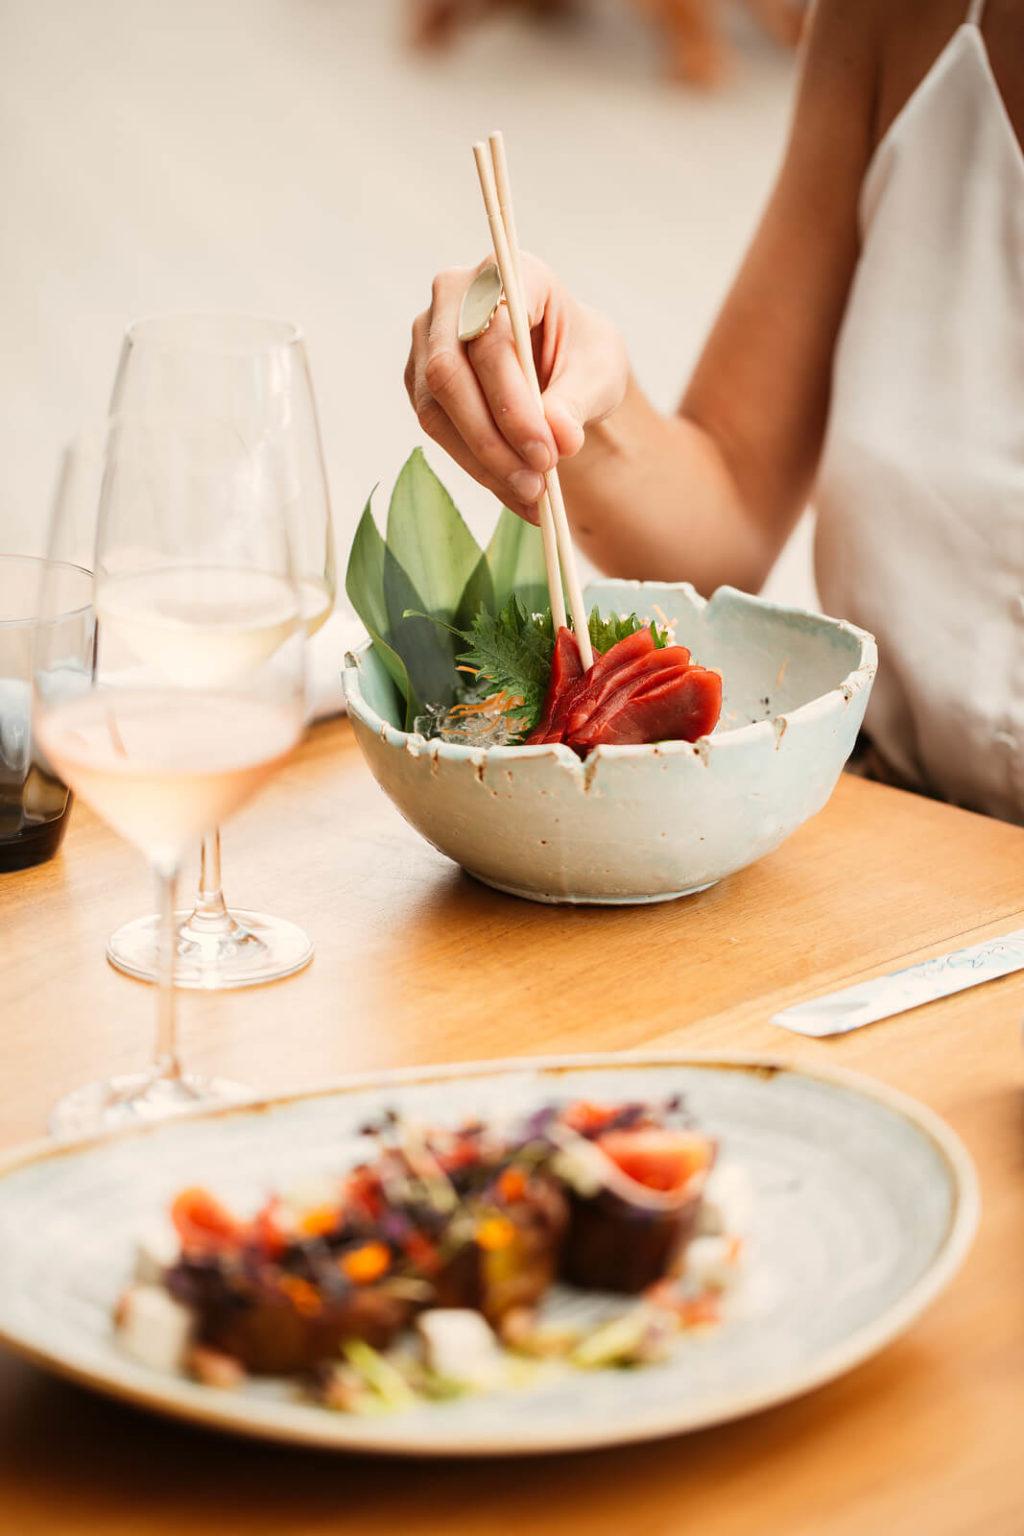 https://www.white-ibiza.com/wp-content/uploads/2020/03/white-ibiza-restaurants-nikki-beach-ibiza-2020-09-1024x1536.jpg